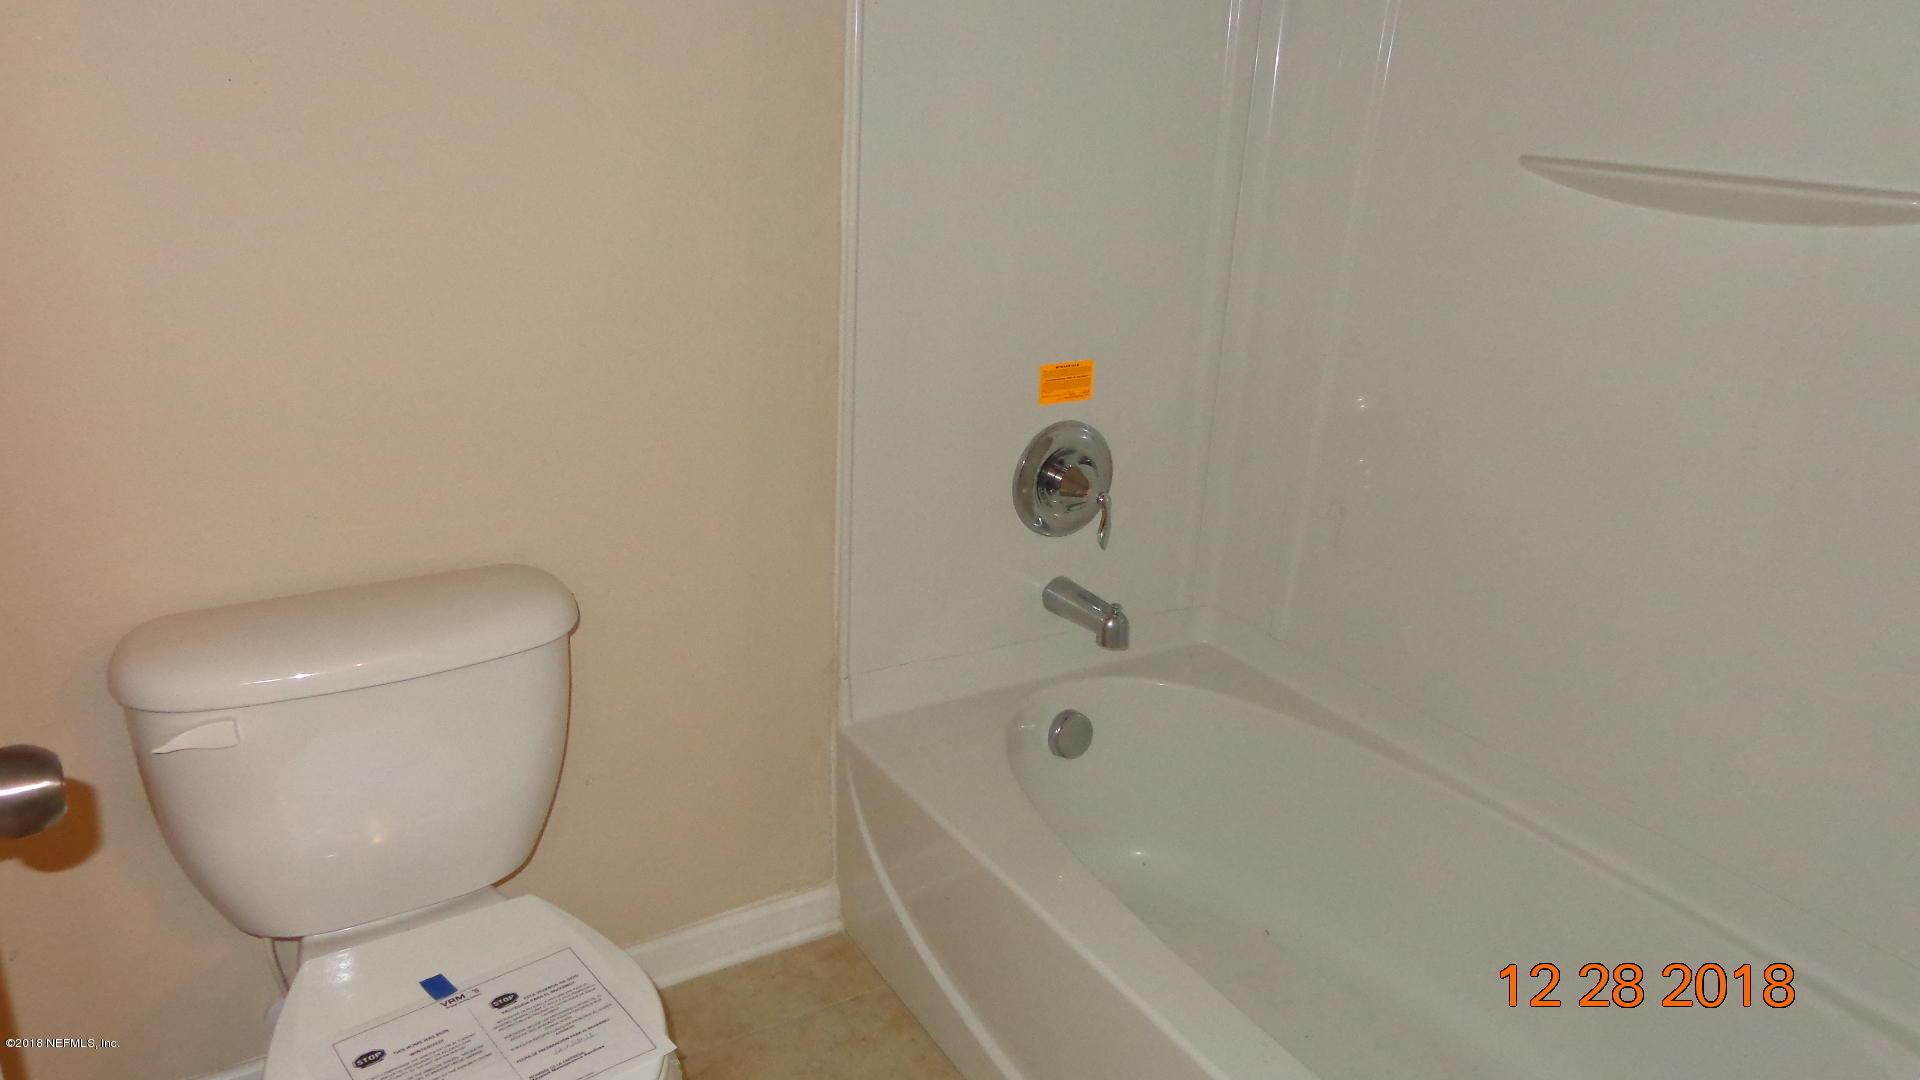 642 BRIAR VIEW, ORANGE PARK, FLORIDA 32065, 4 Bedrooms Bedrooms, ,2 BathroomsBathrooms,Residential - single family,For sale,BRIAR VIEW,974082